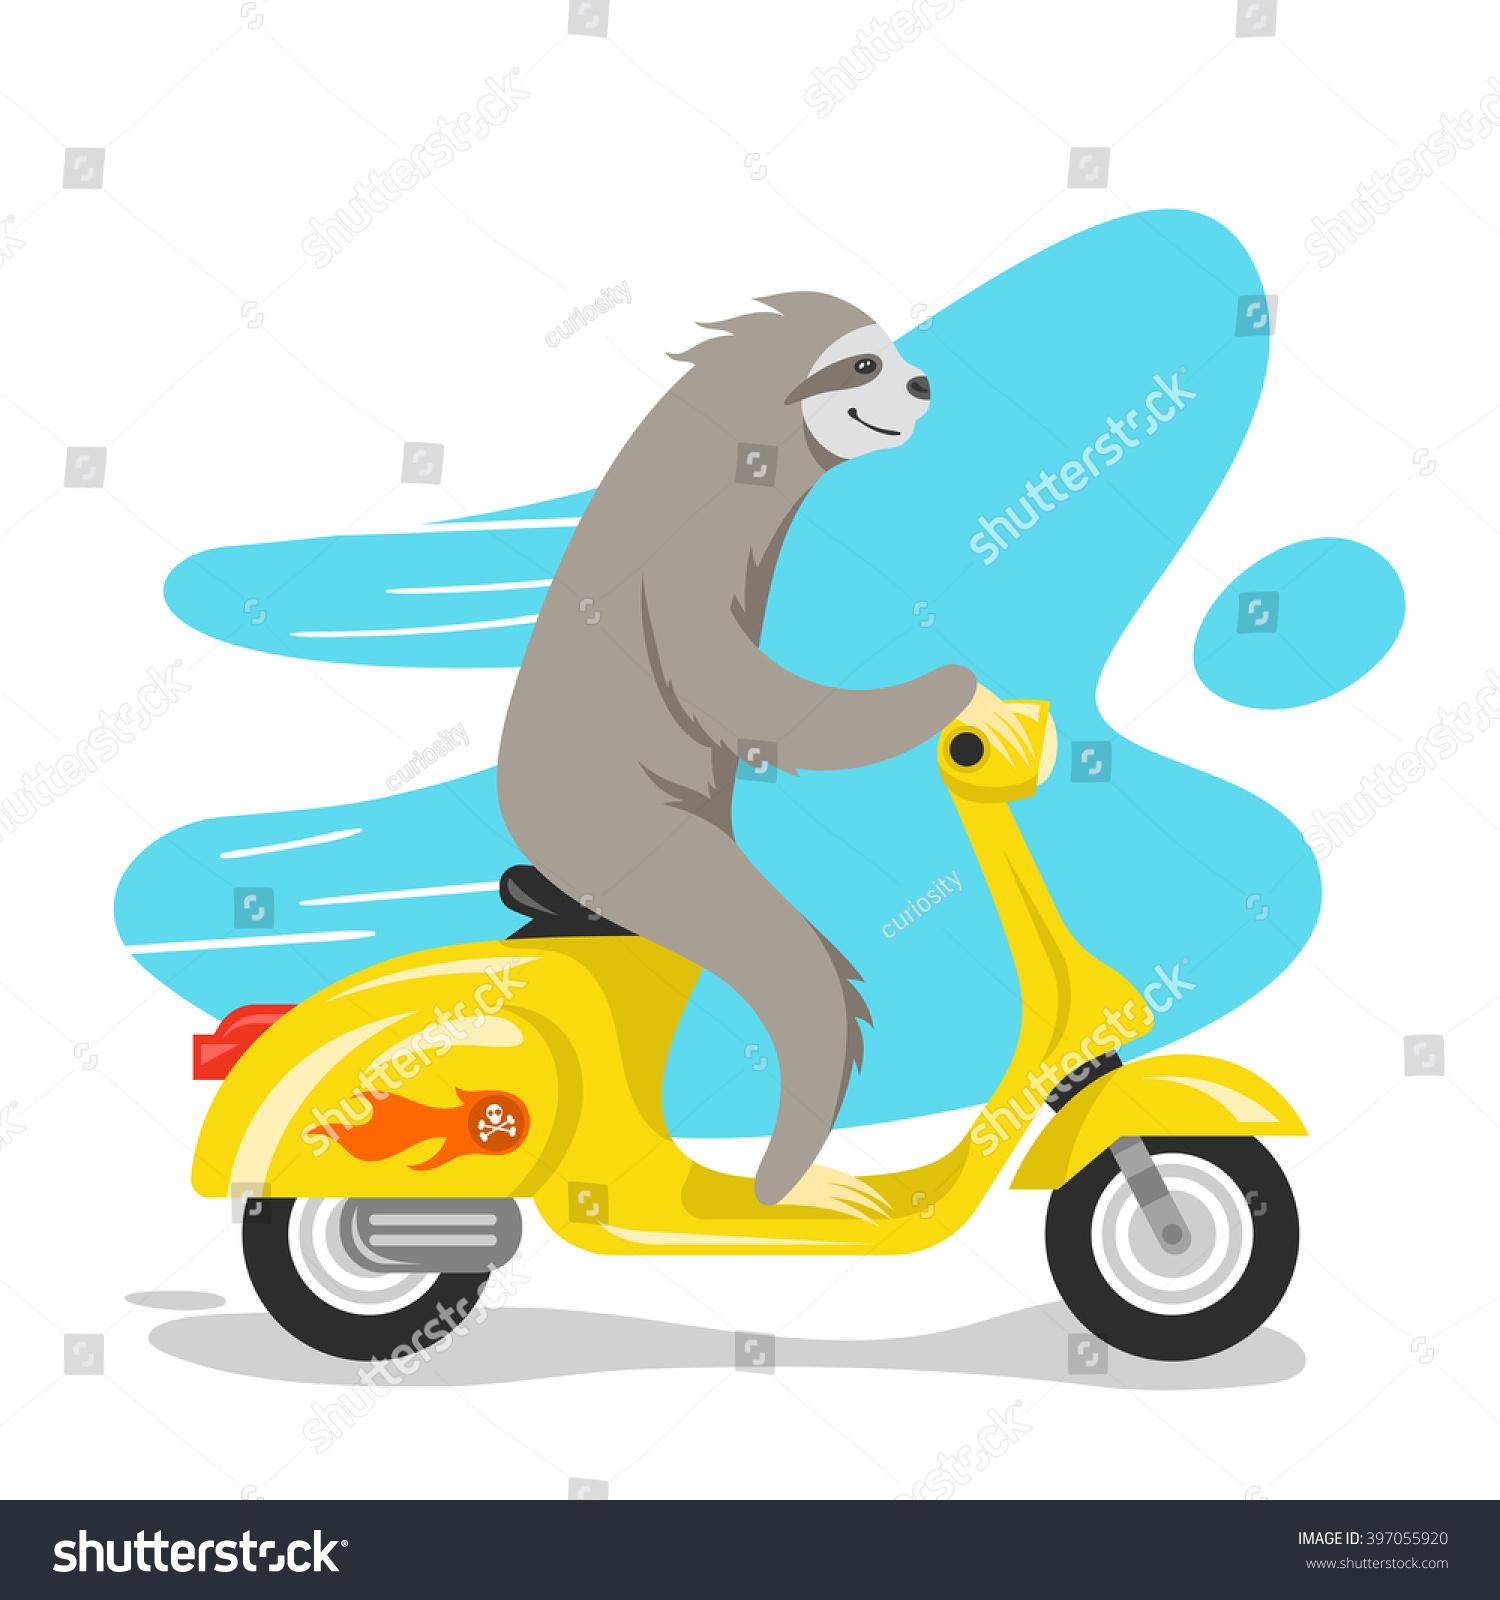 Vector Illustration Happy Cute Sloth Riding Stock Vector 397055920 ...